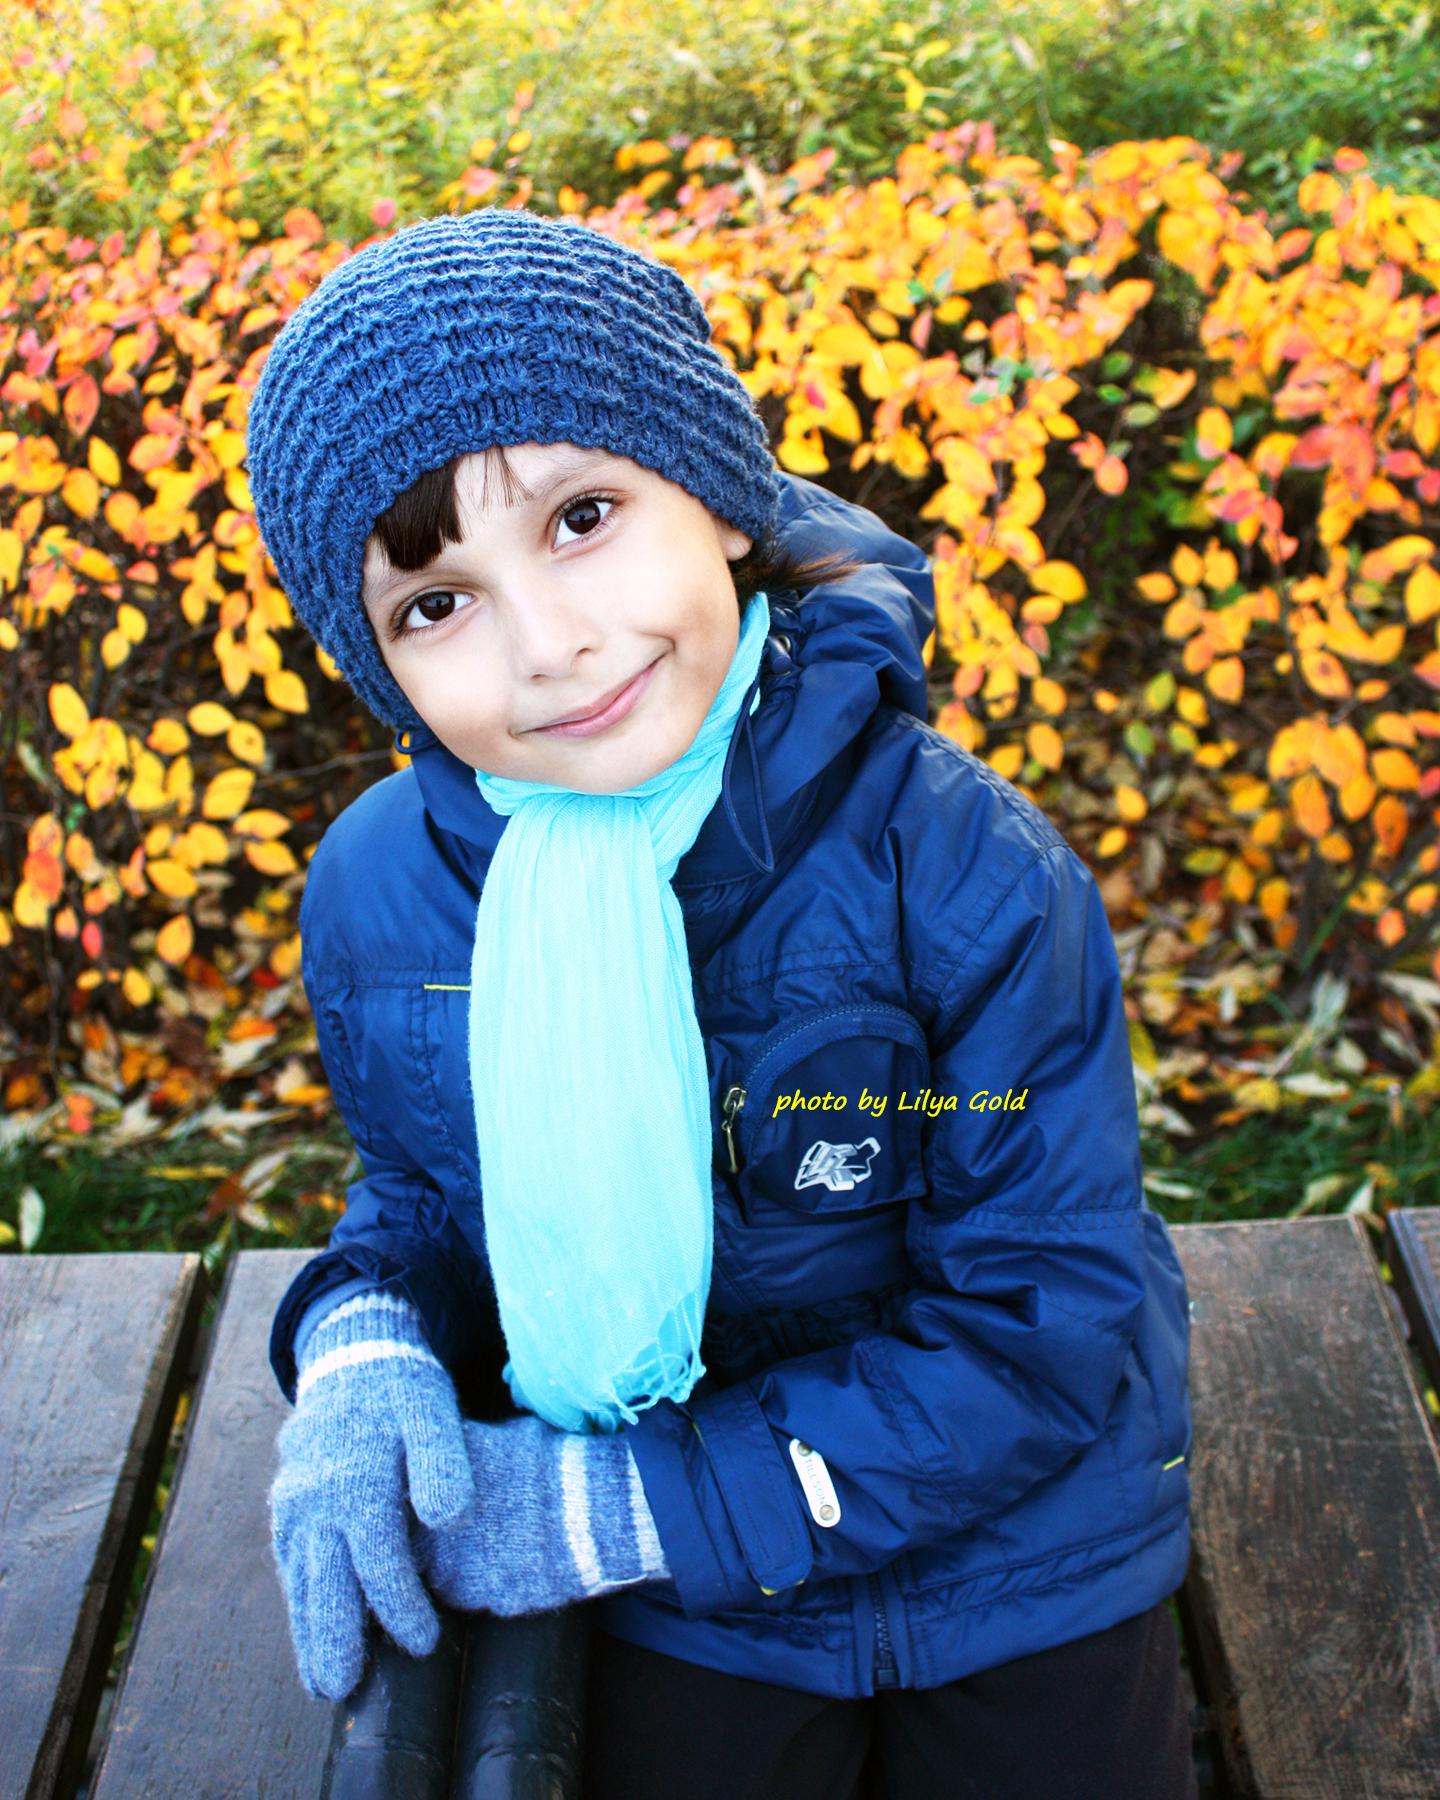 LilyaGold_19.10.2012.jpg